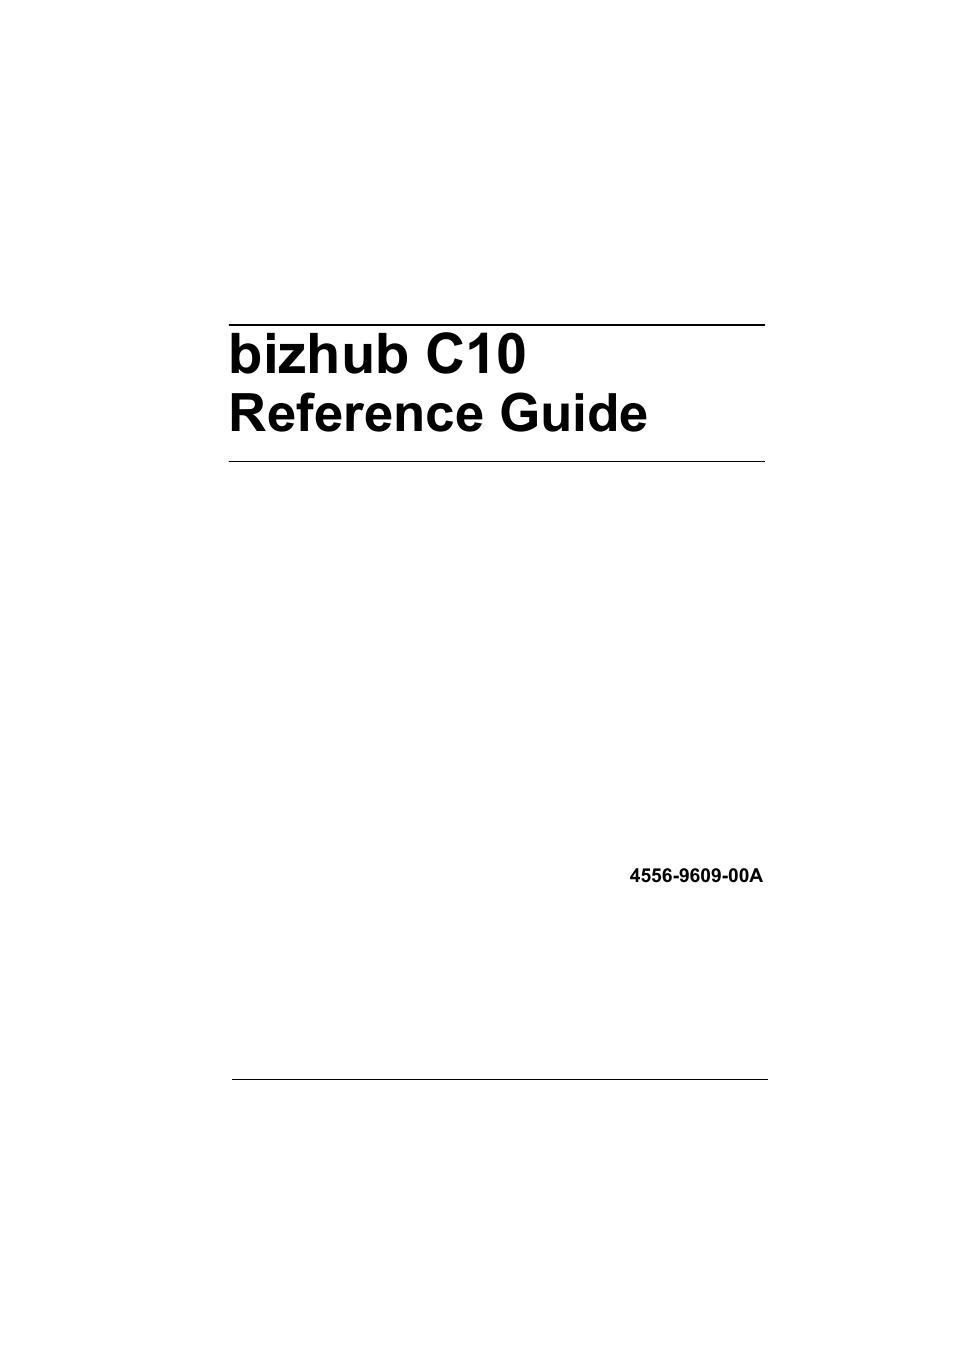 Konica Minolta bizhub C10X User Manual | 198 pages | Also for: bizhub C10